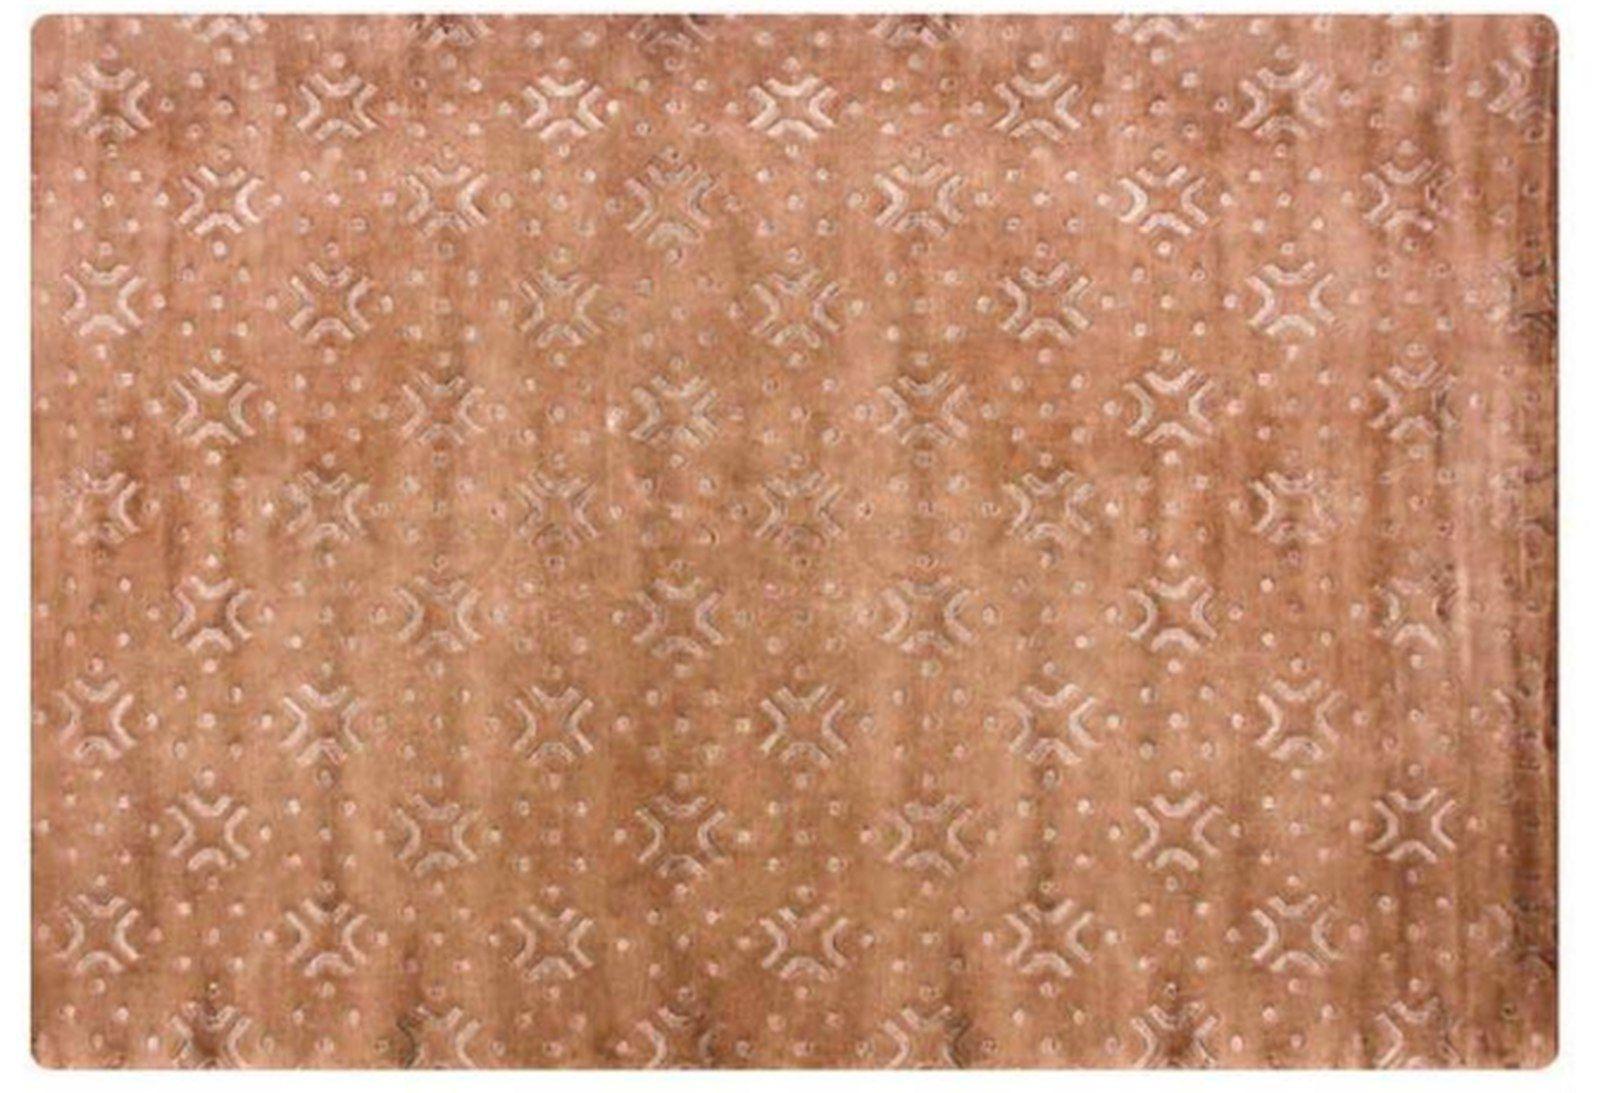 Tapete Indiano Mayfair ref. 15870 feito à mão - 200 x 250 cm